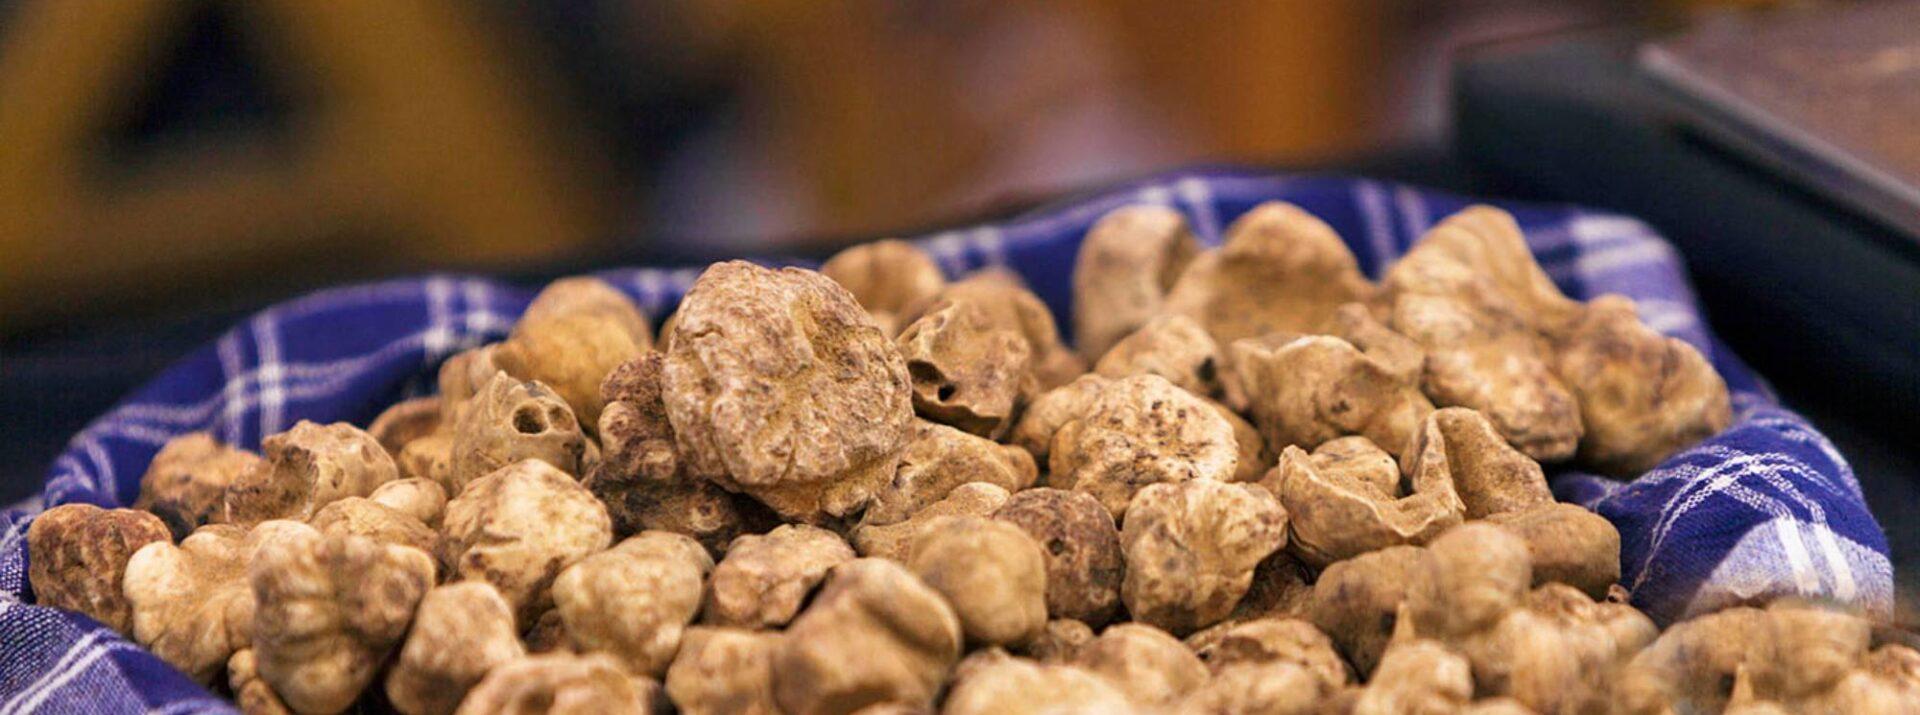 coccia-white-truffles